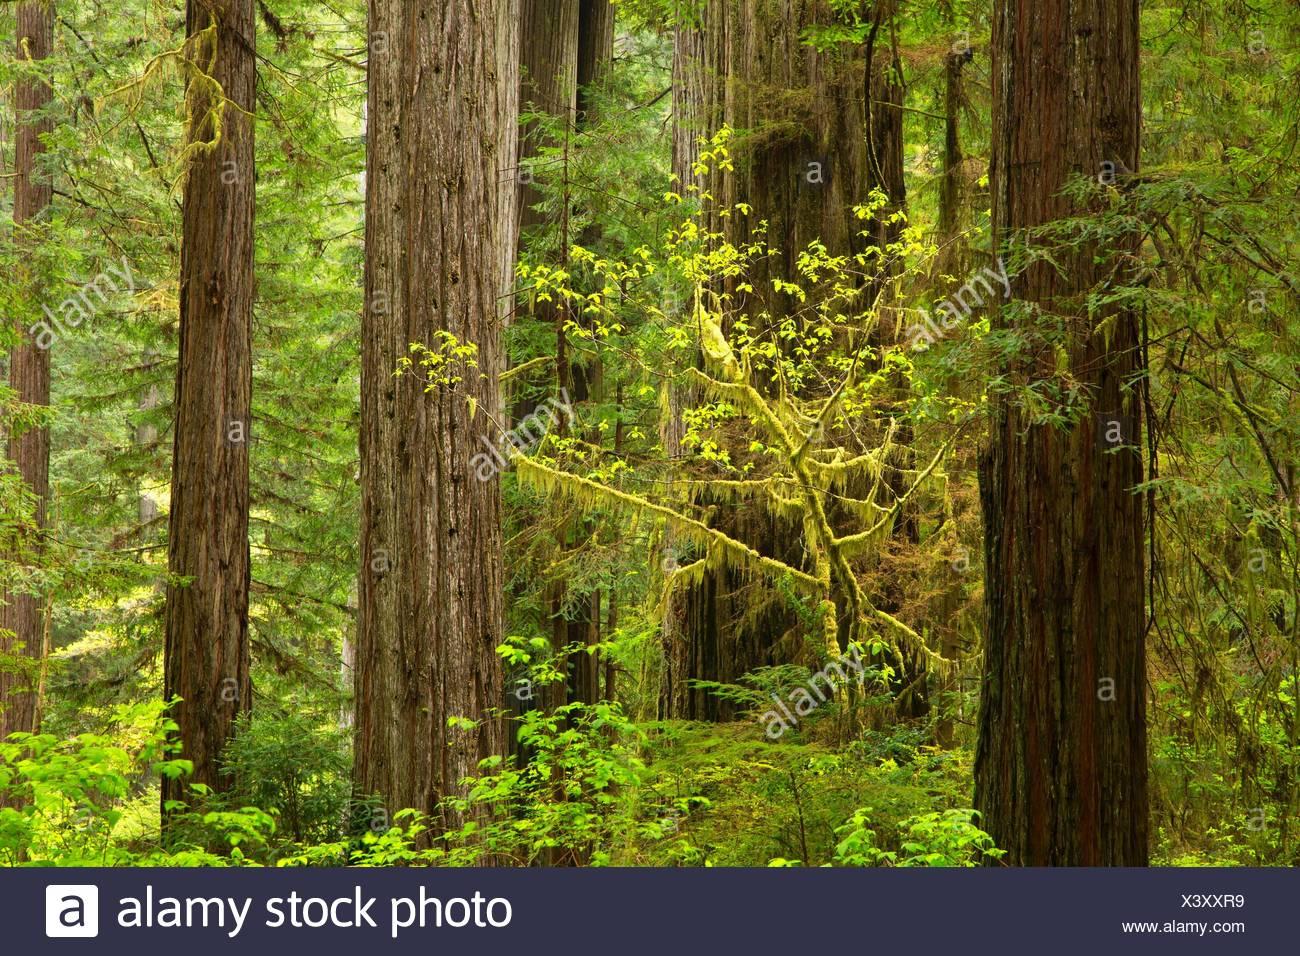 Coast redwood (Sequoia sempervirens) forest, Prairie Creek Redwoods State Park, Redwood National Park, California. - Stock Image